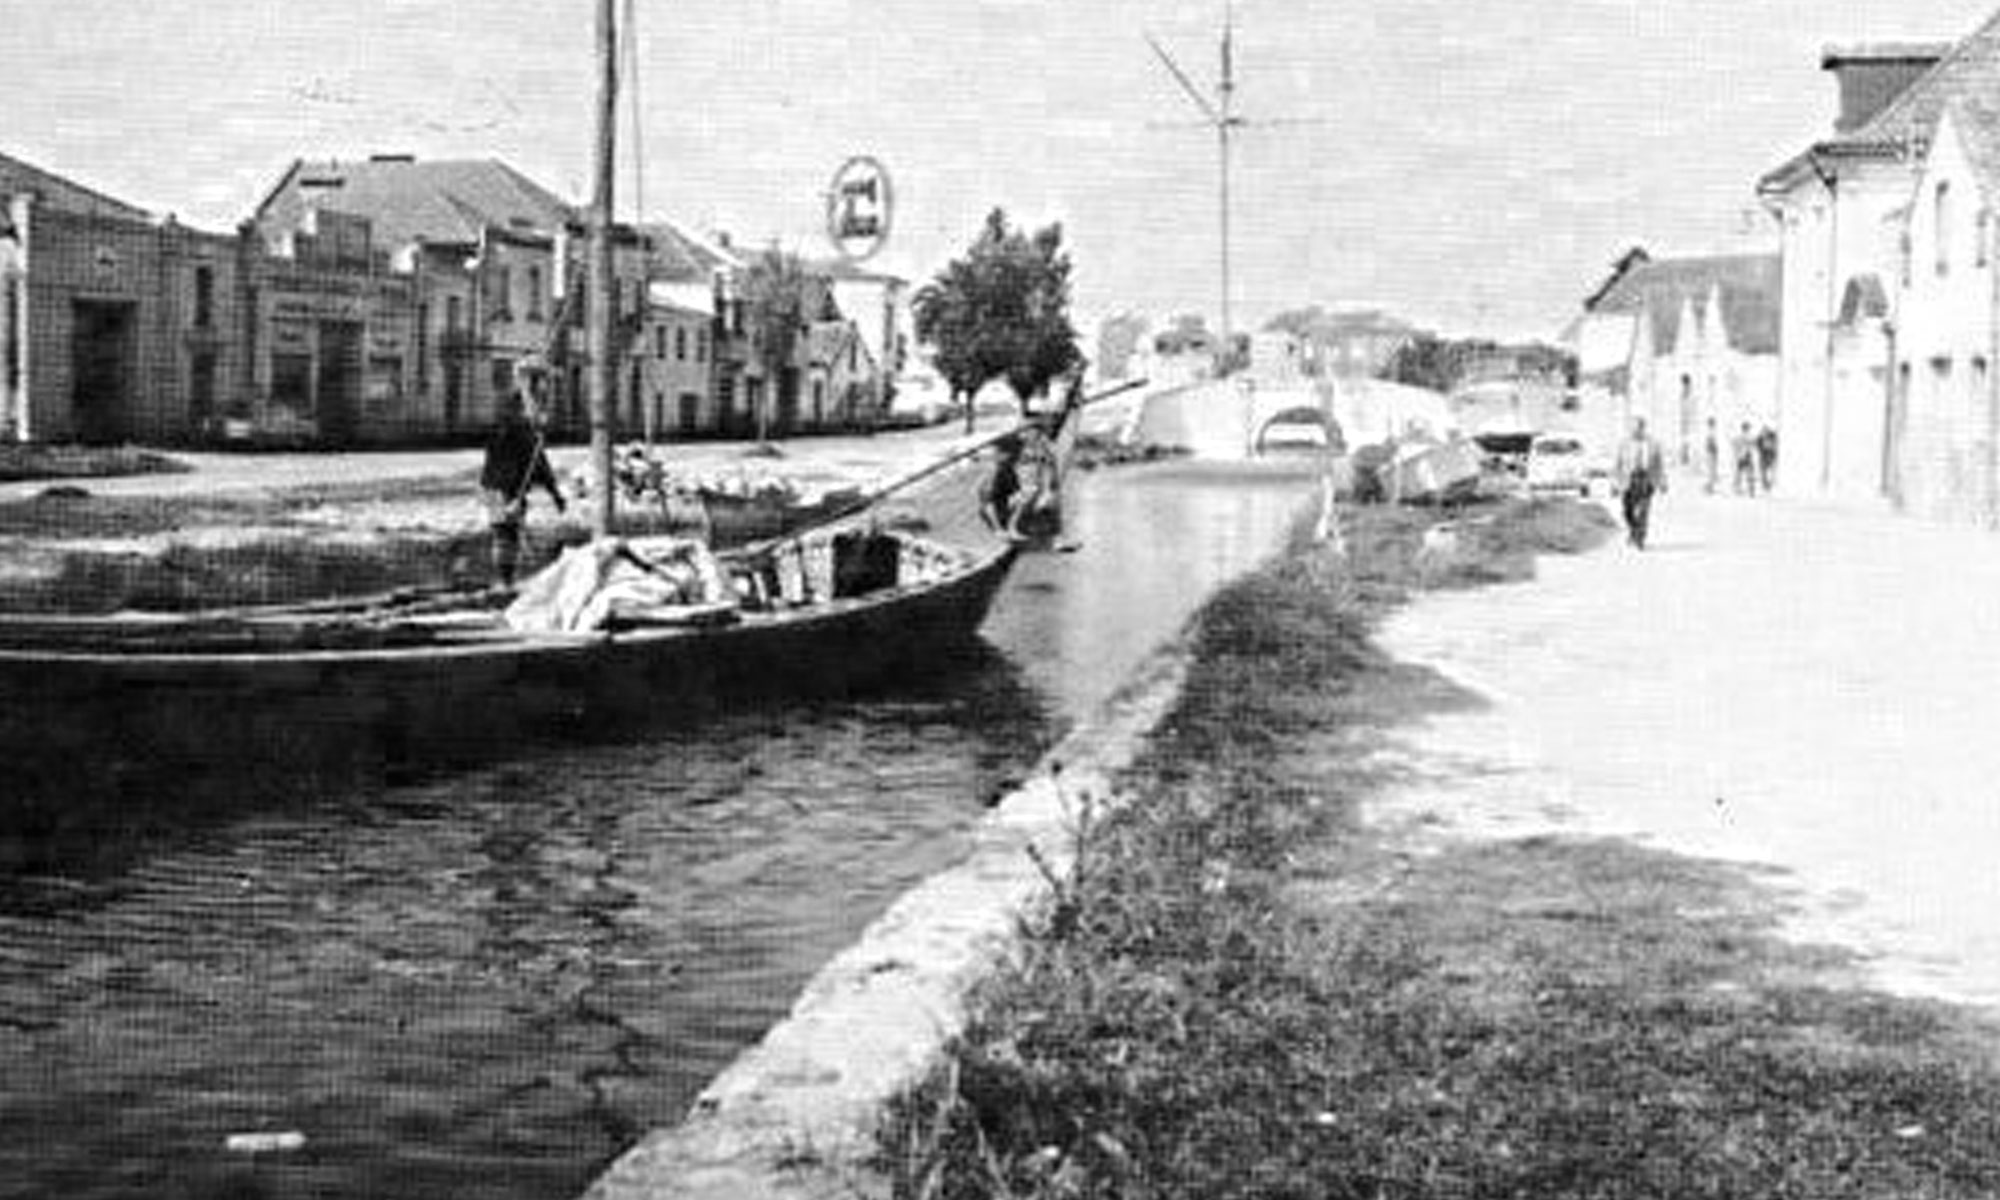 ponte-dobadoura-bairro-alboi-aveiro